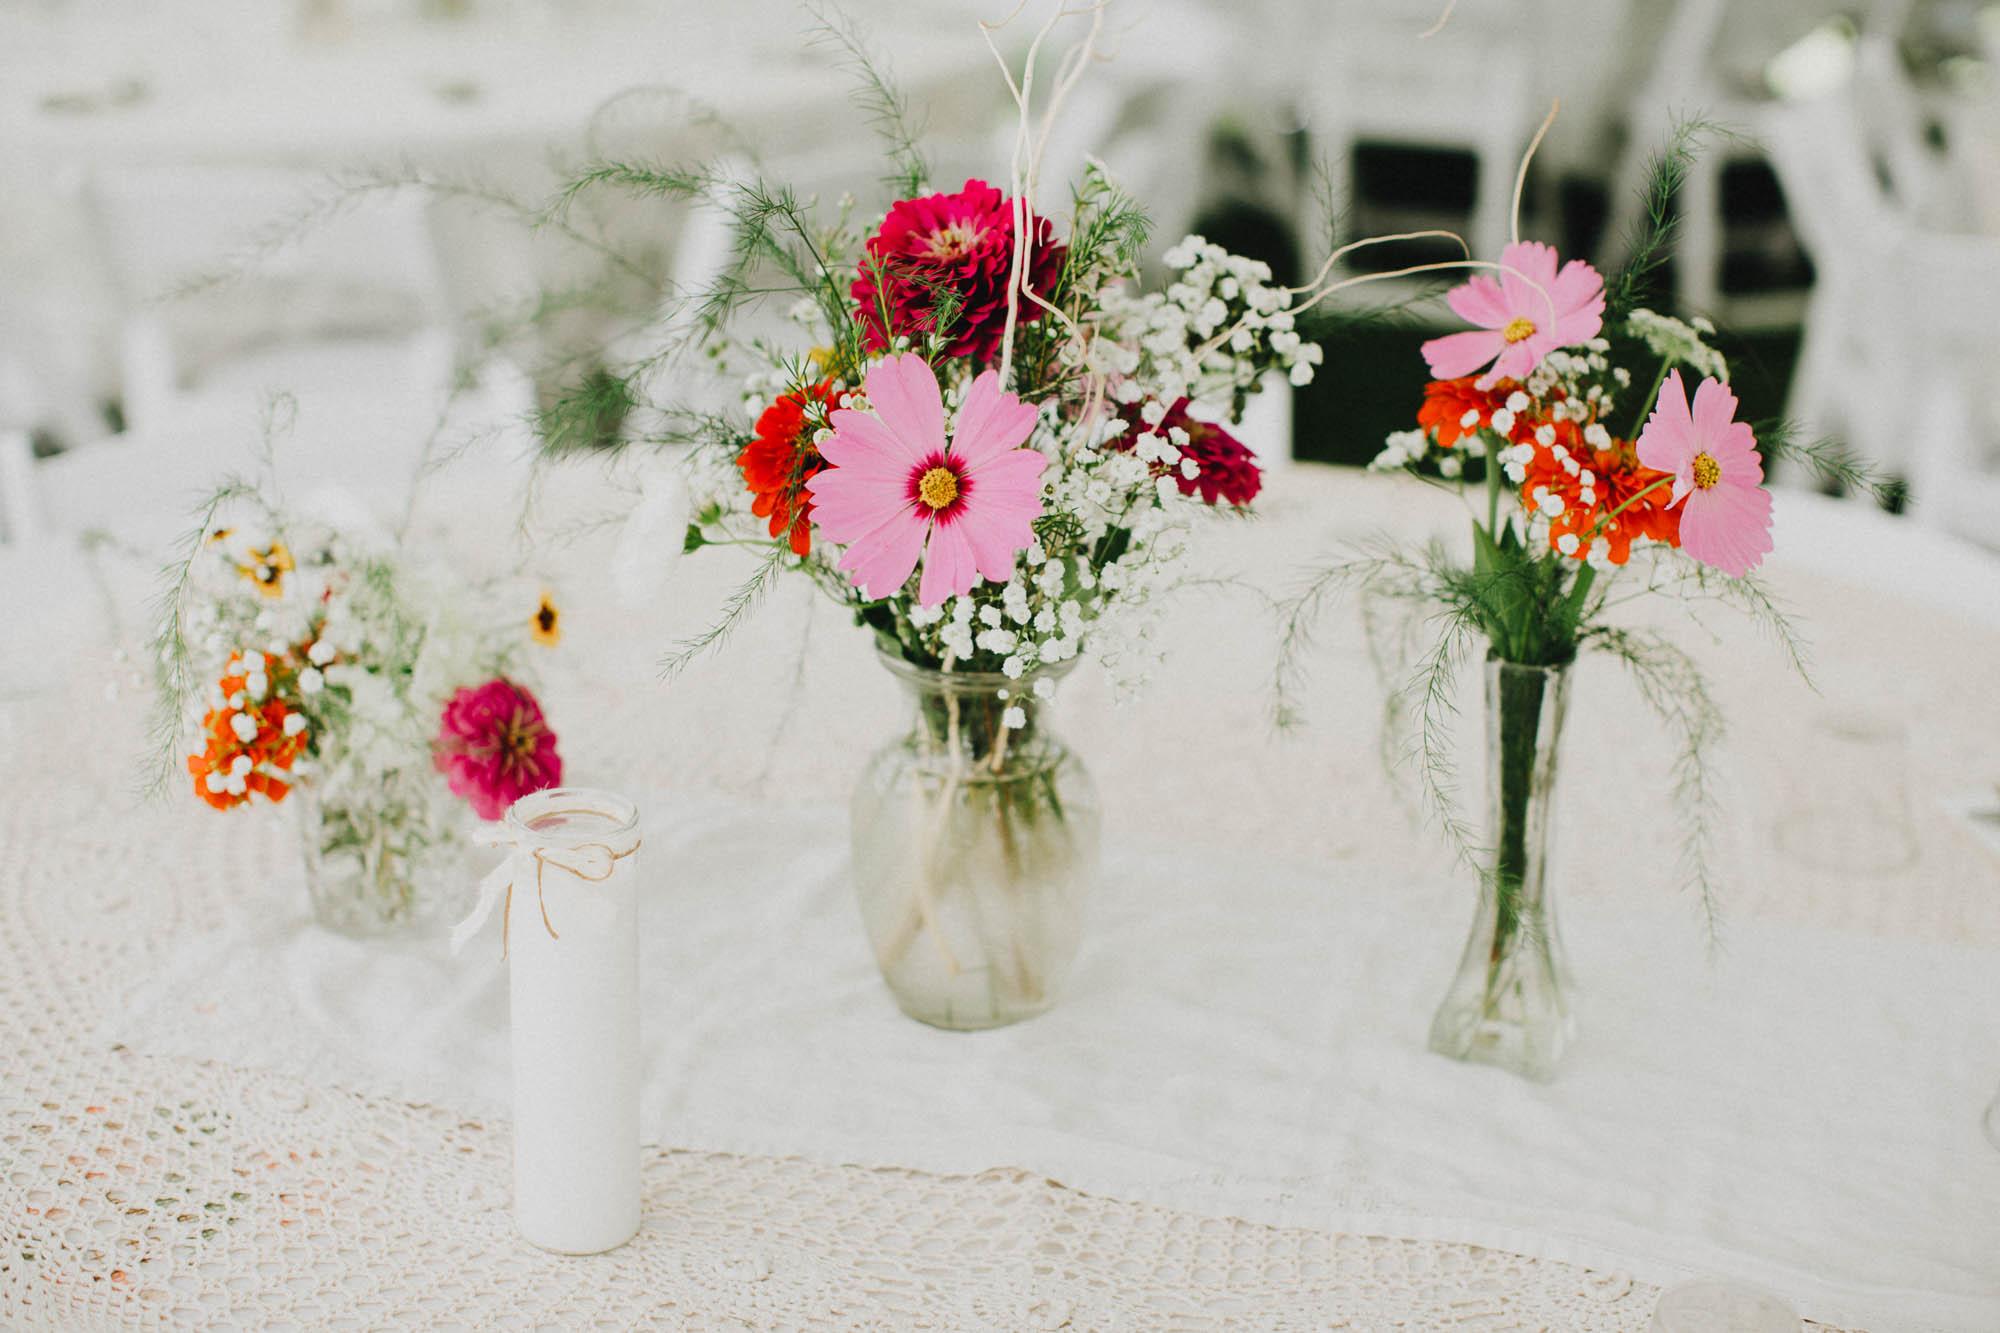 Leah-Graham-Outdoor-DIY-Michigan-Wedding-Details-009@2x.jpg